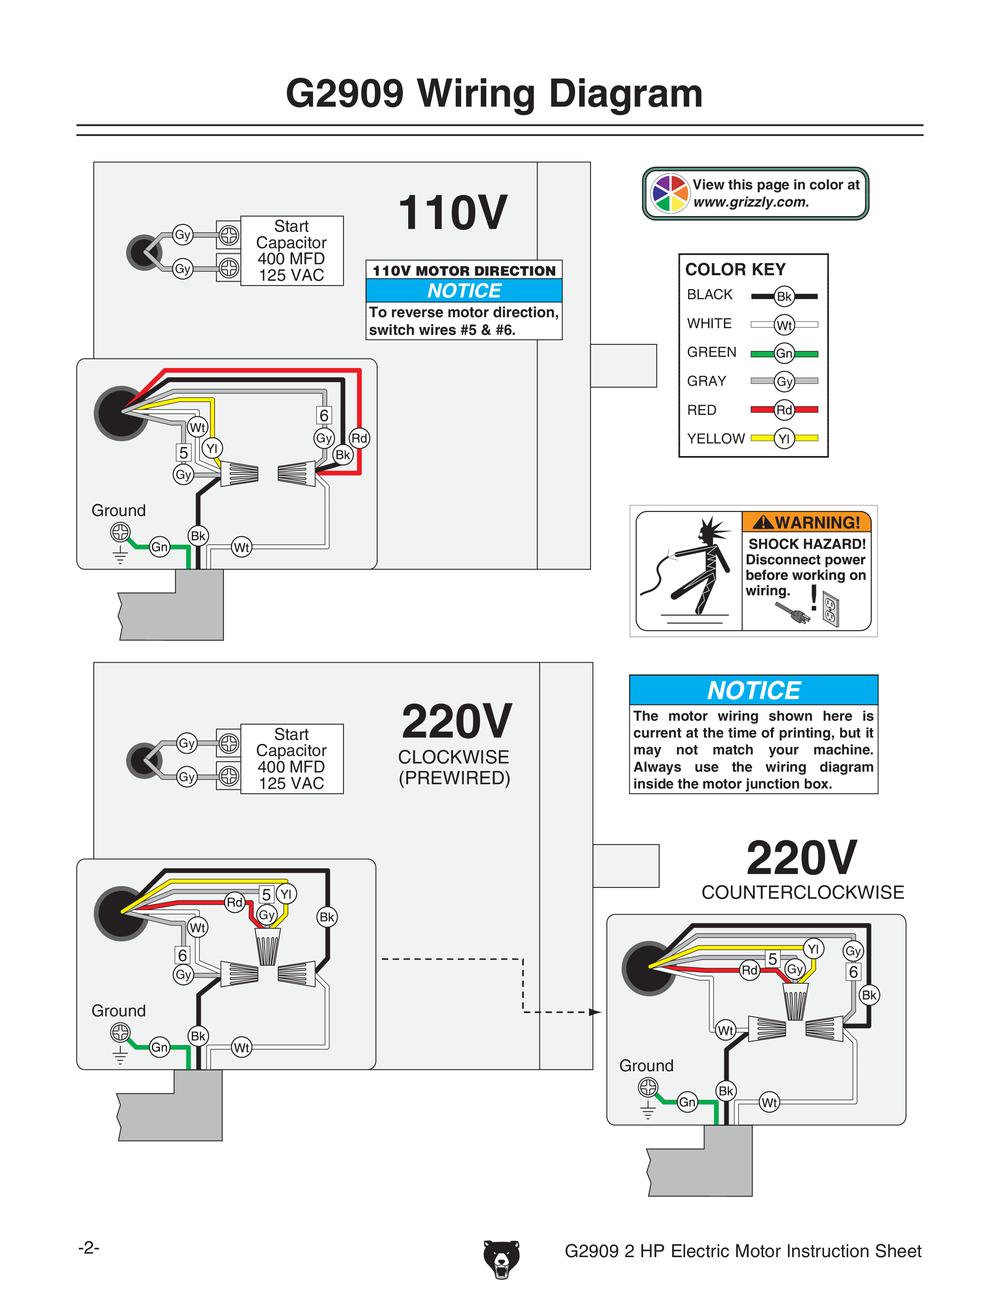 33 220v Switch Wiring Diagram